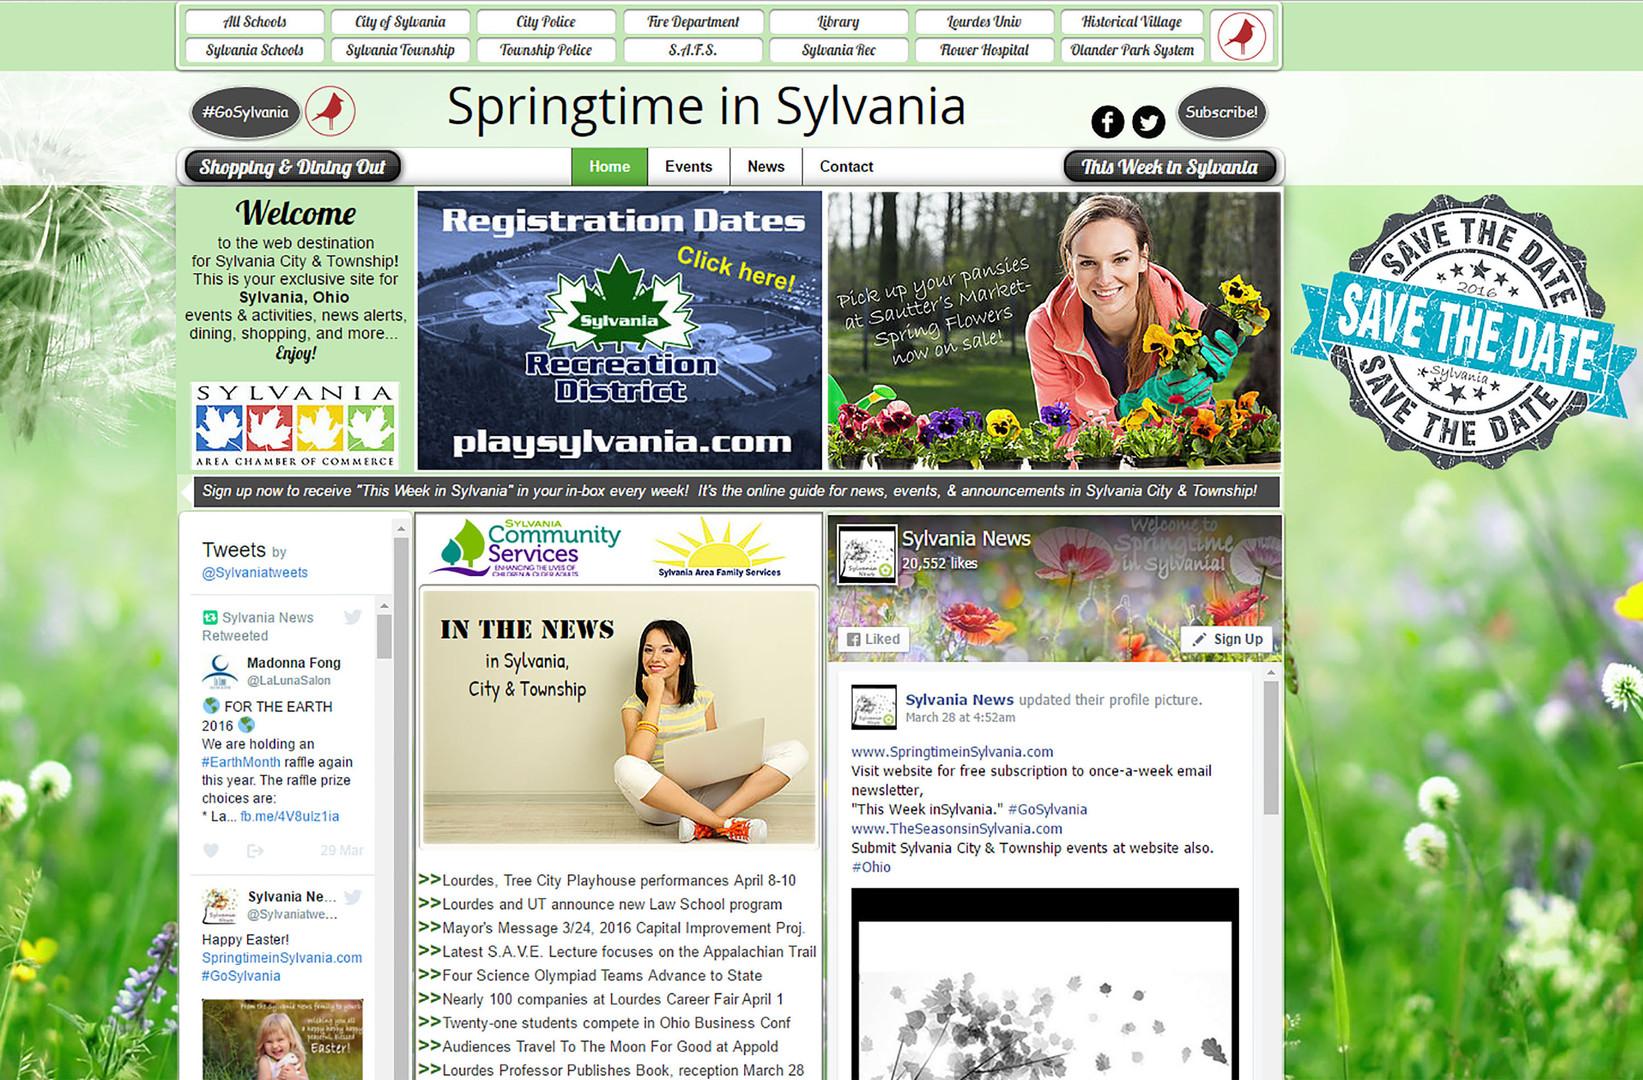 Springtime in Sylvania